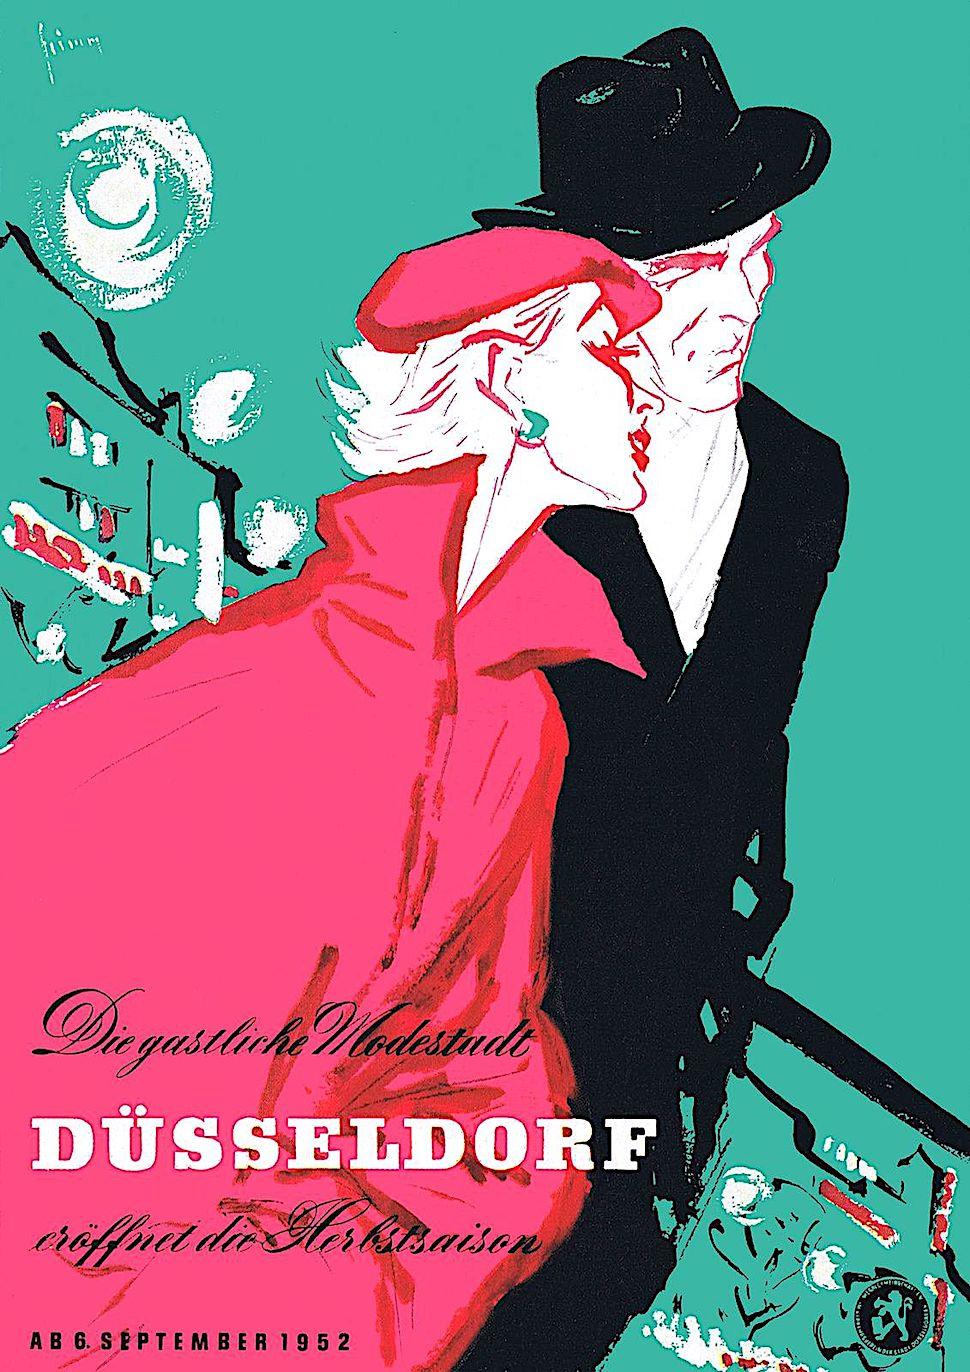 a Gerd Grimm 1952 poster for Dusseldorf